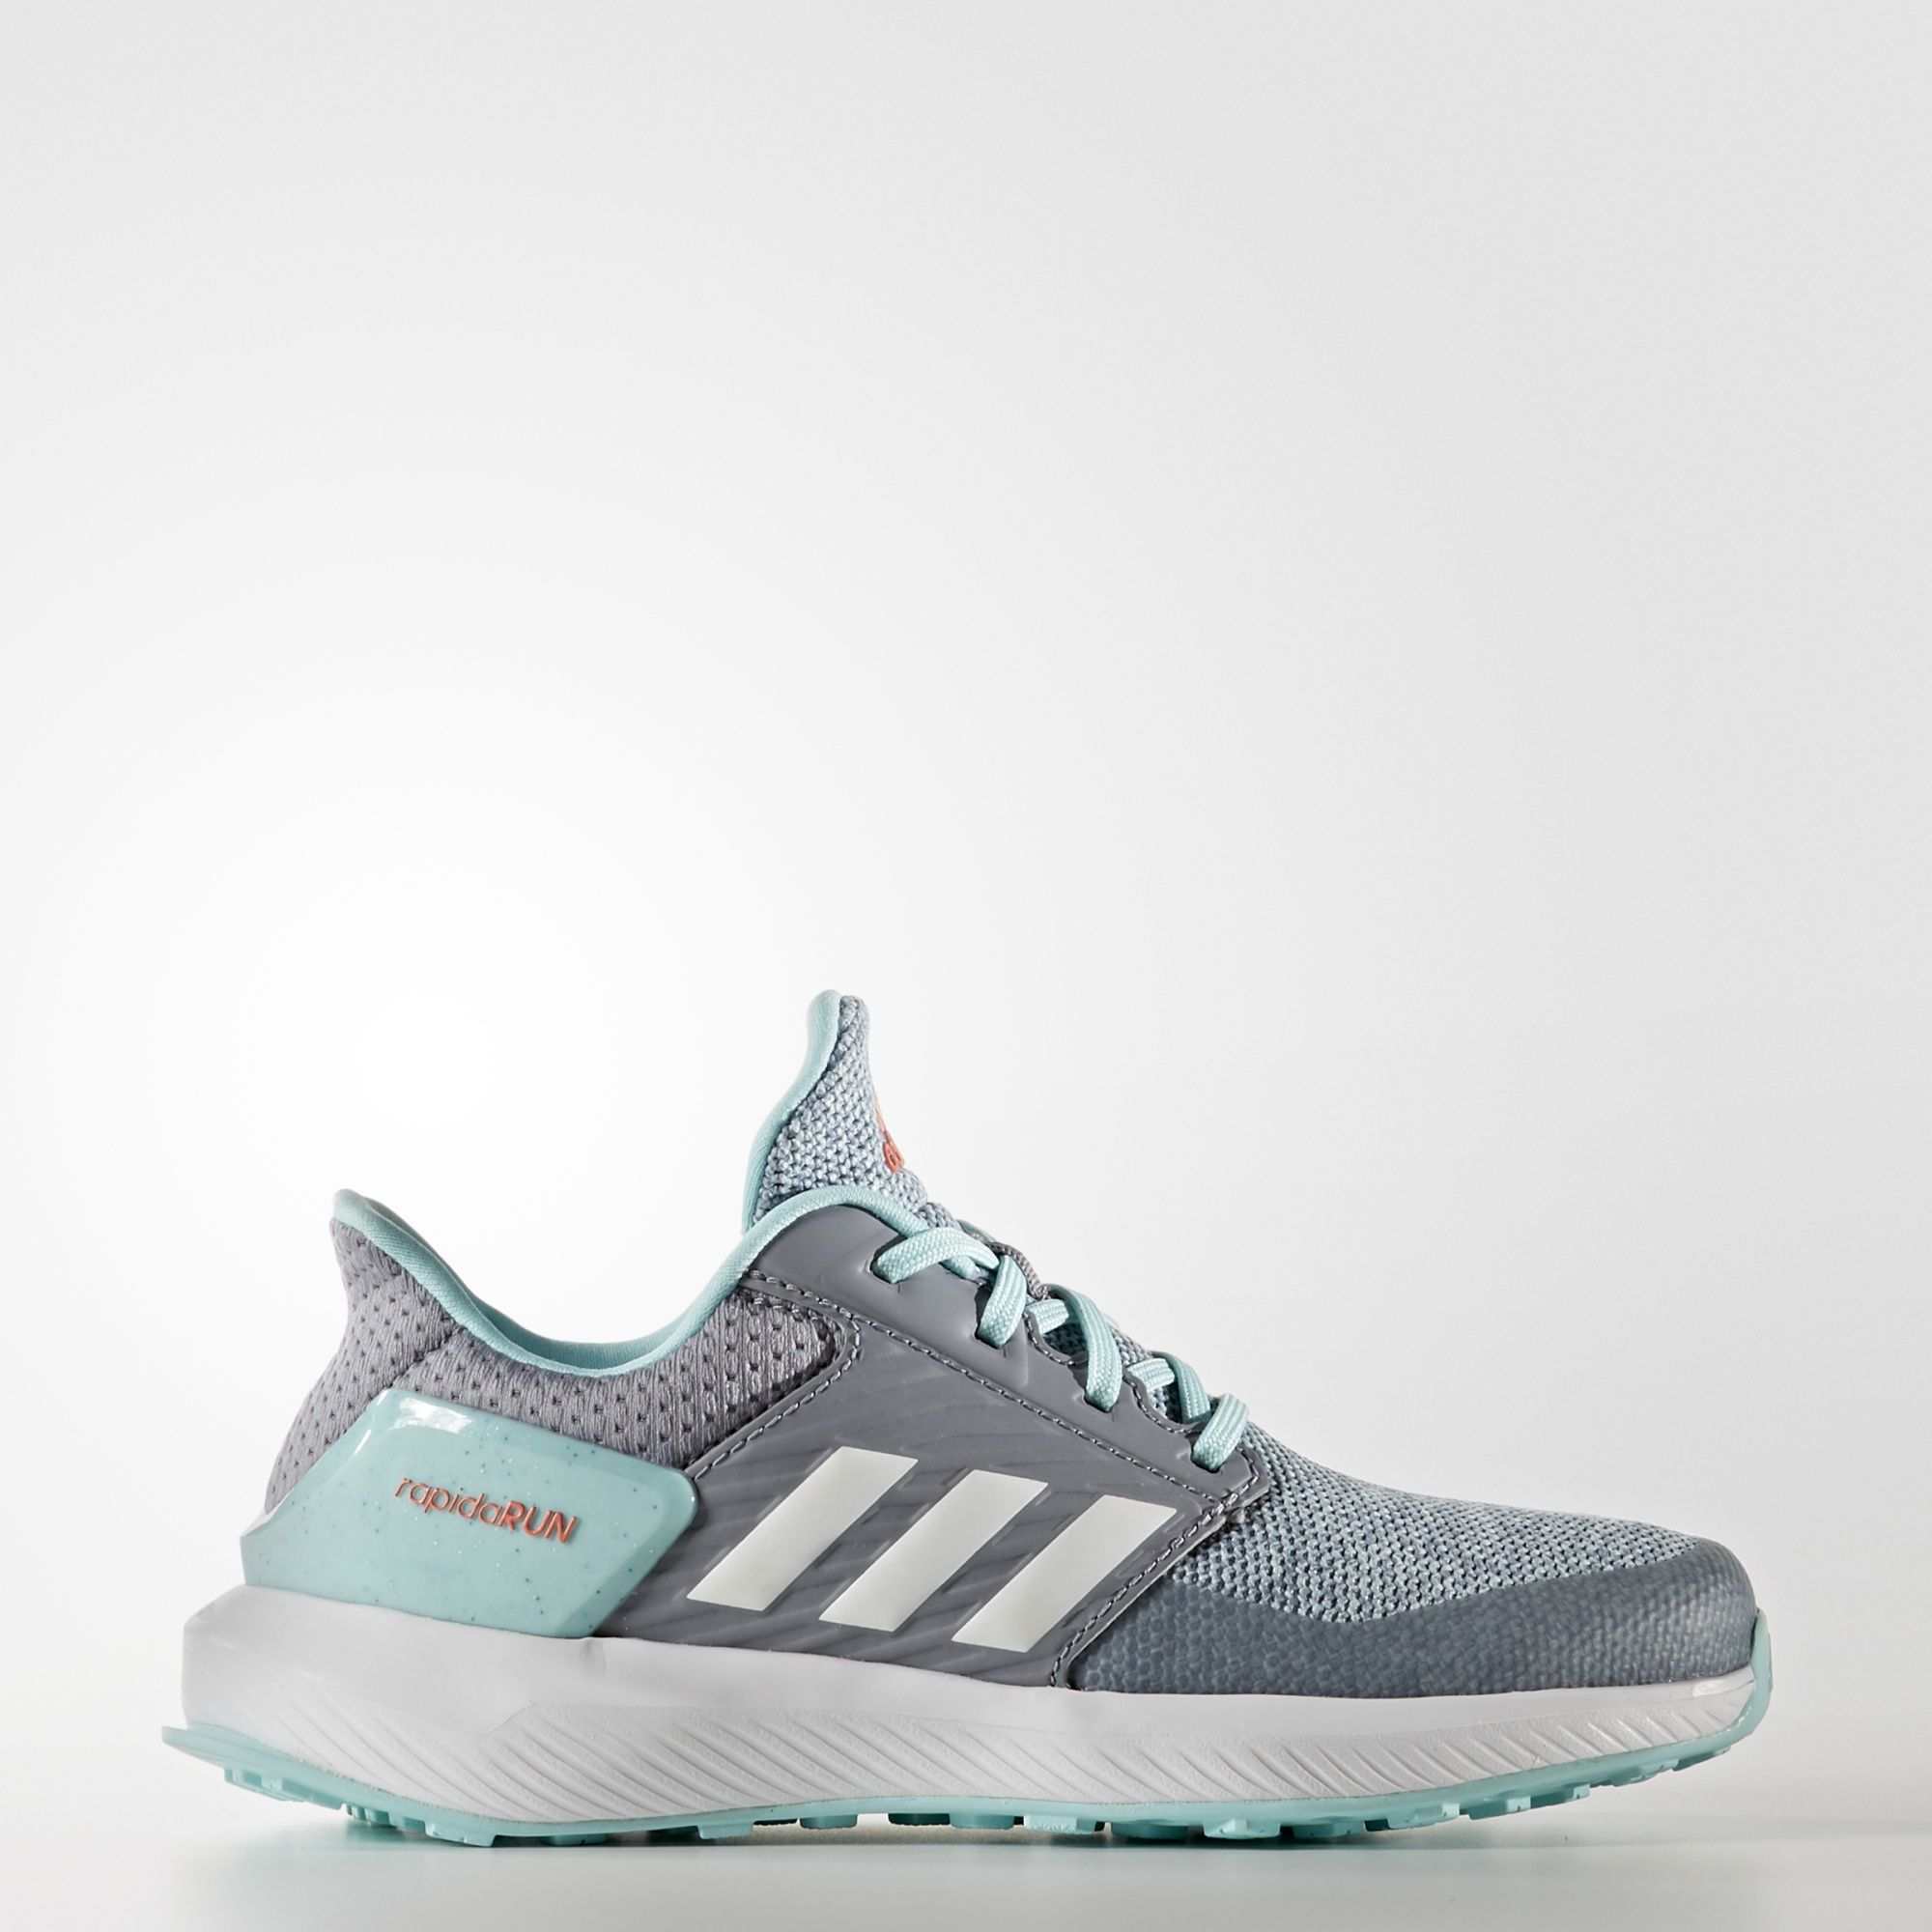 adidas RapidaRun Shoes | Shoes in 2019 | Adidas, Adidas